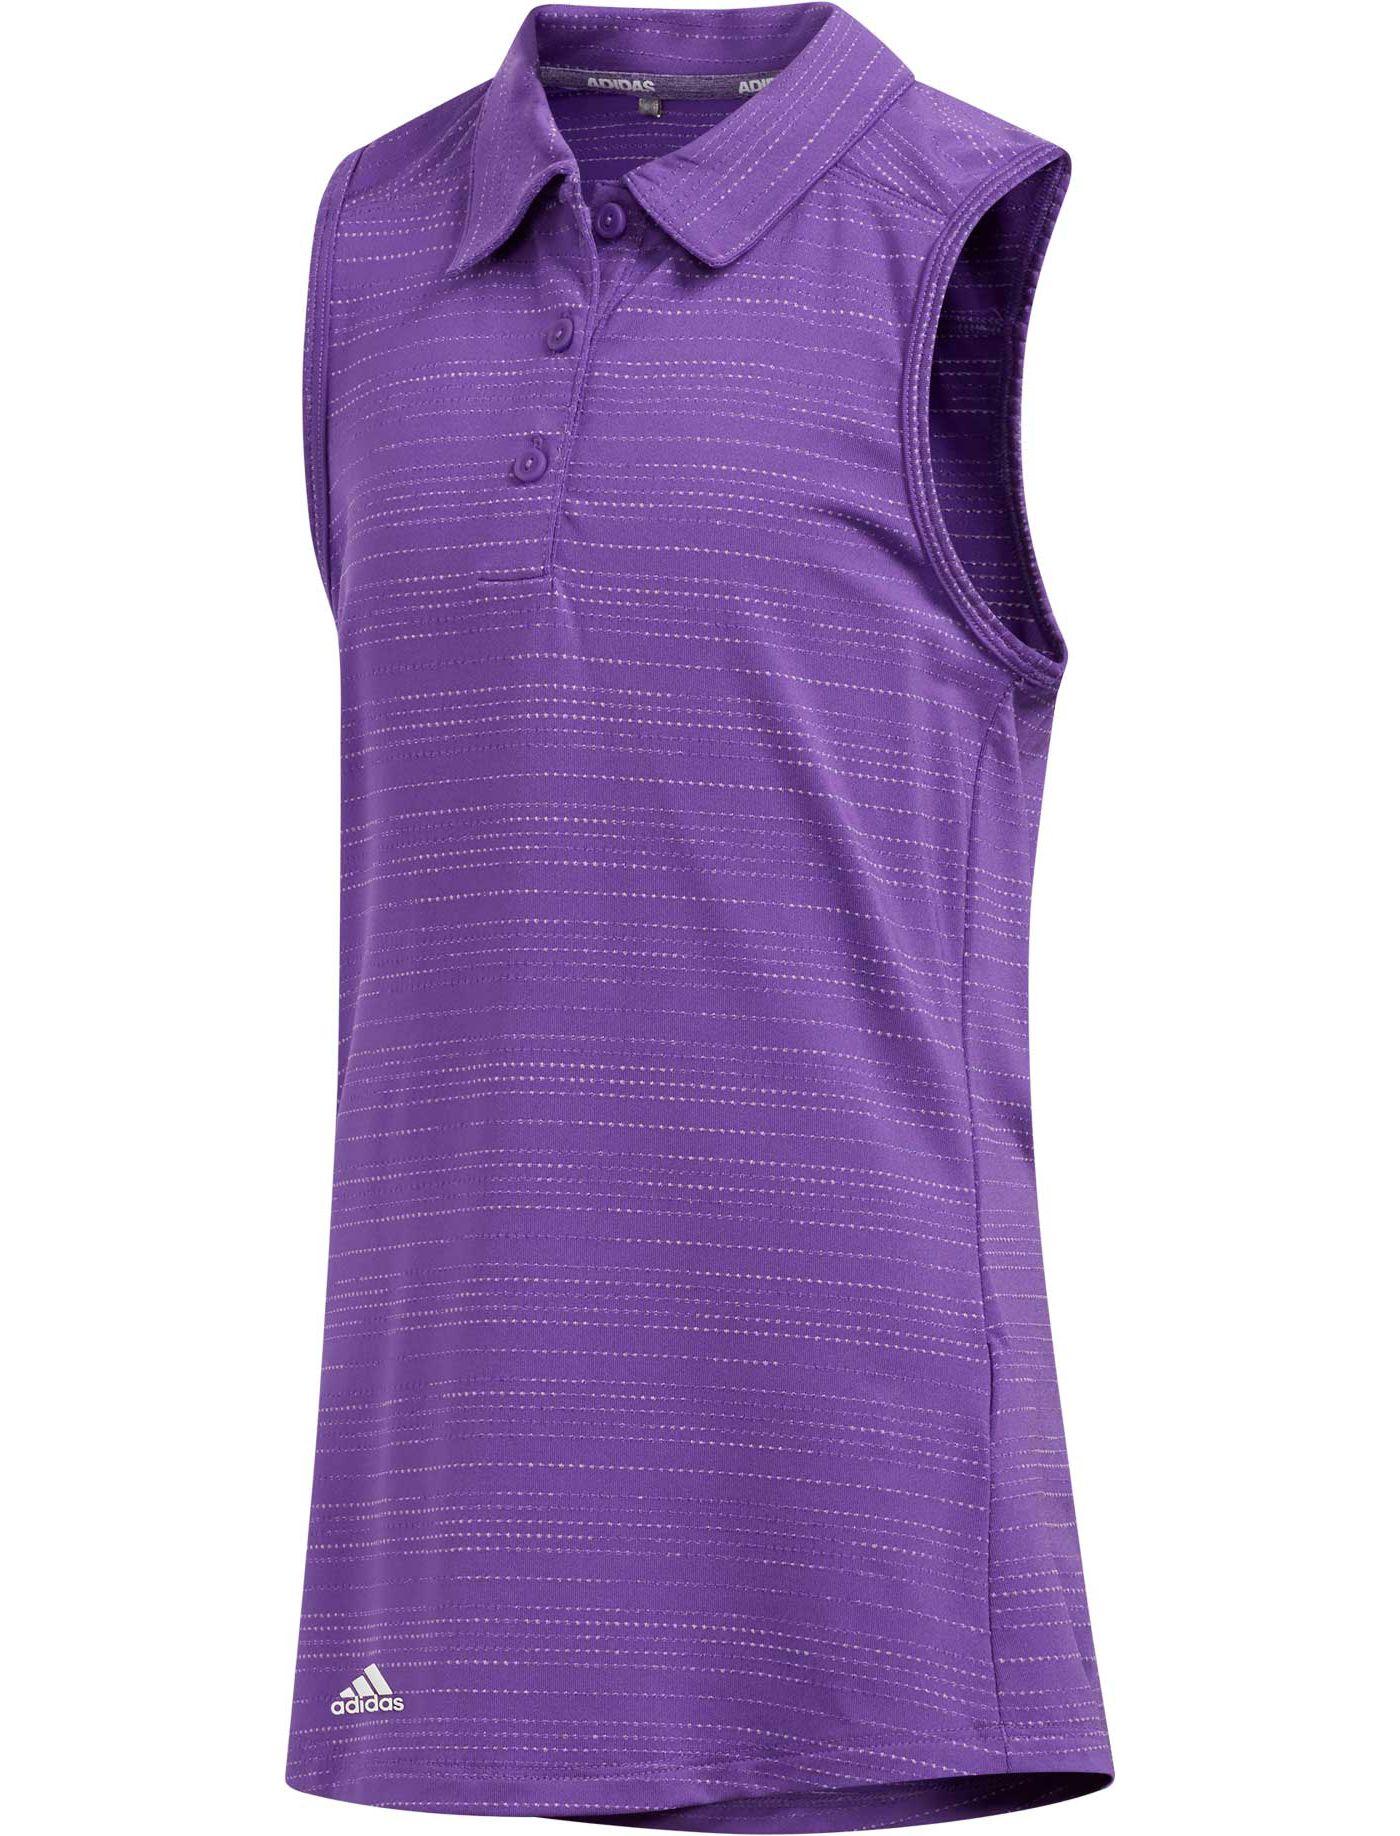 adidas Girls' Microdot Novelty Sleeveless Golf Polo